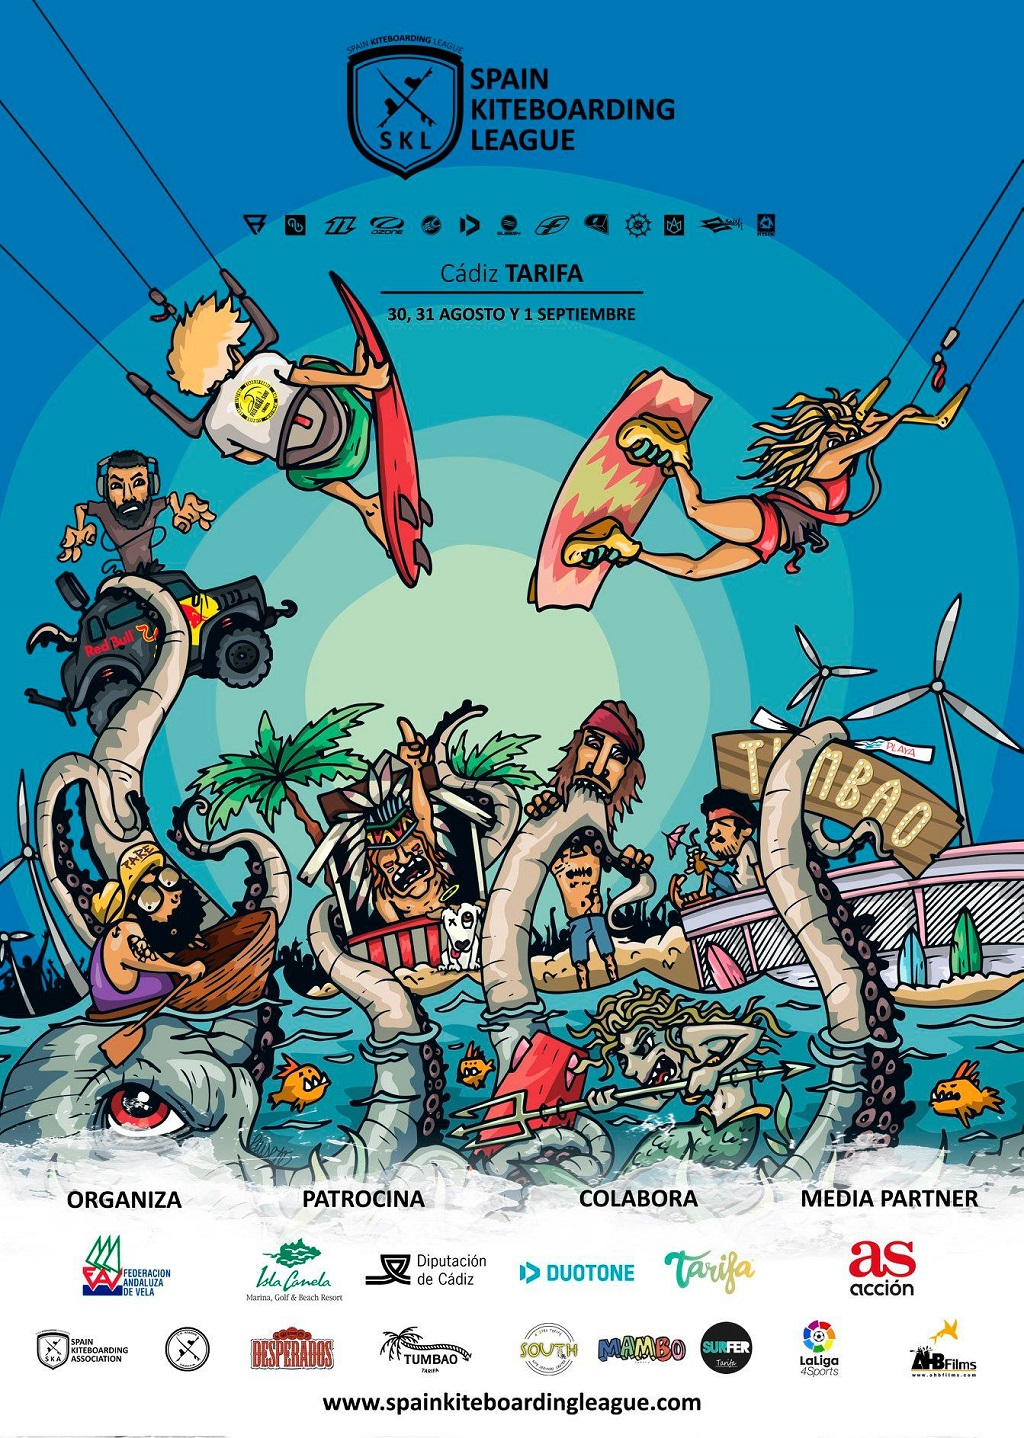 Spain Kiteboarding League Tarifa 2019